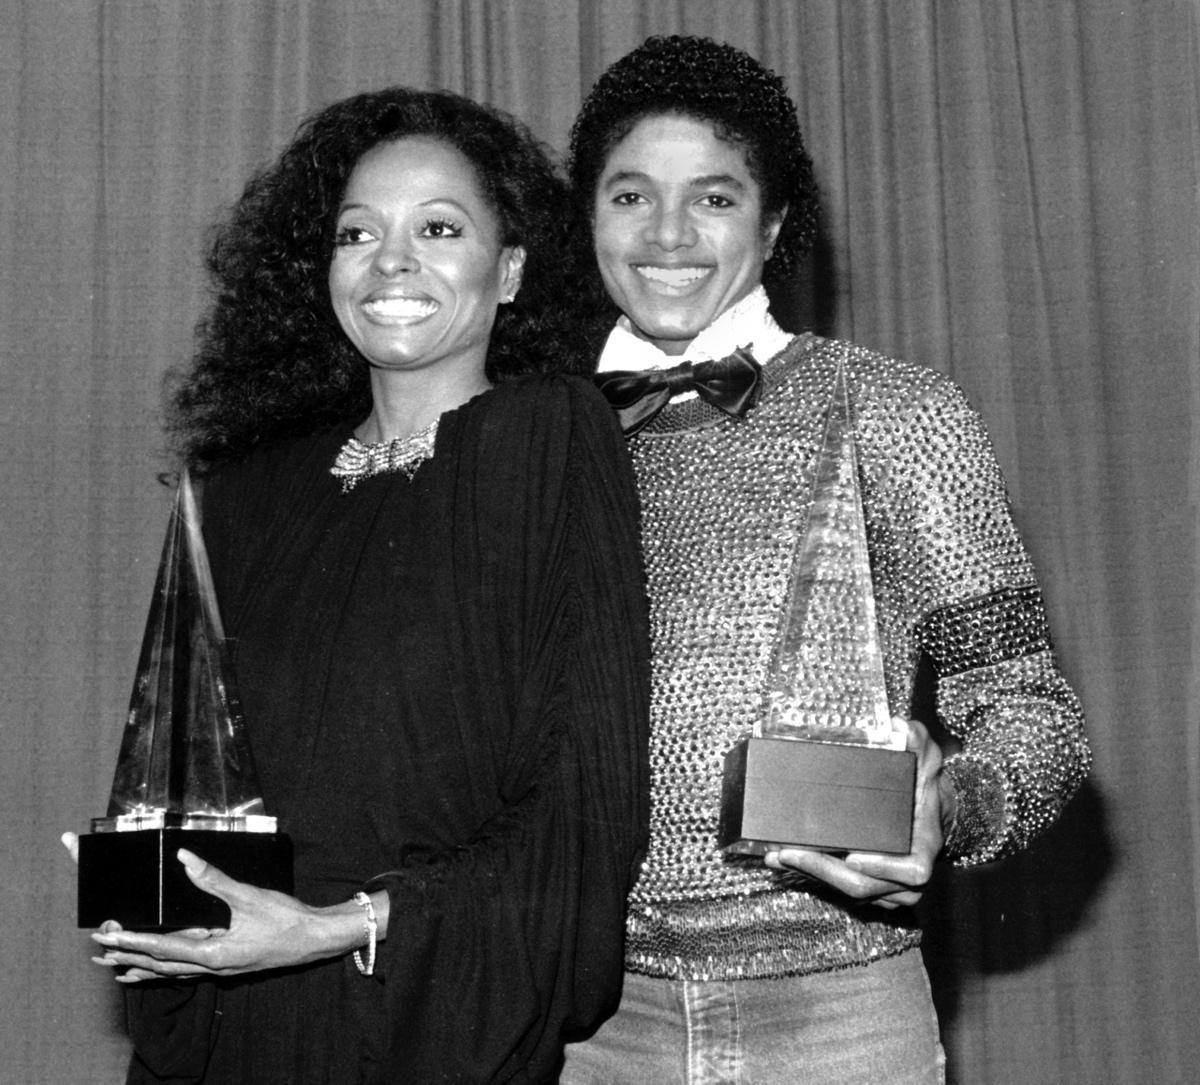 michael-jackson-diana-ross-american-music-awards-1981 She's still the Boss: Miss Diana Ross - A Living Legend